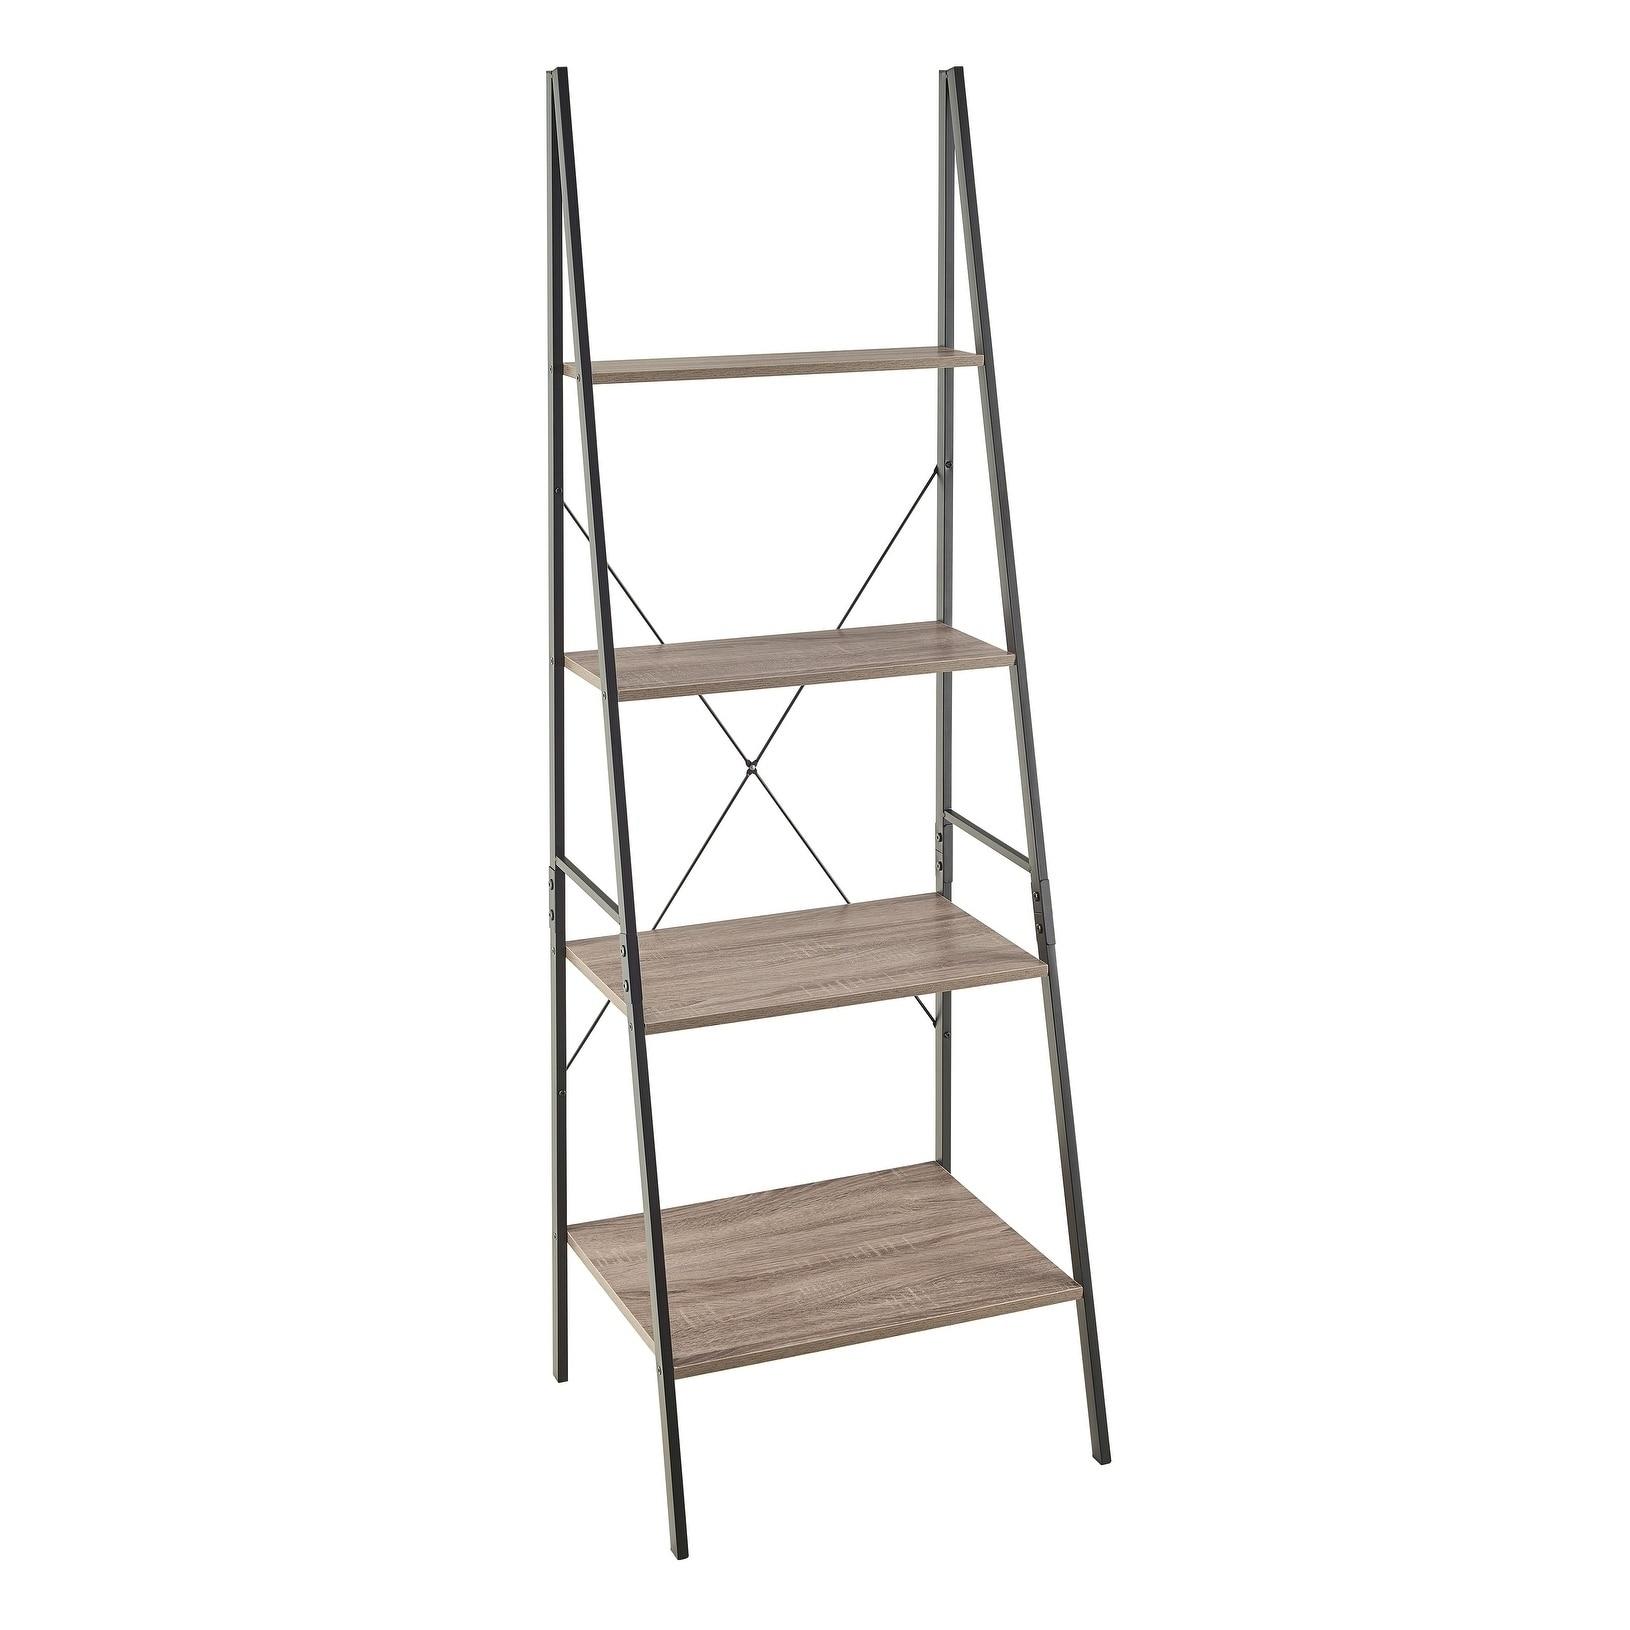 Shop Carbon Loft Morse Industrial Ladder Bookshelf